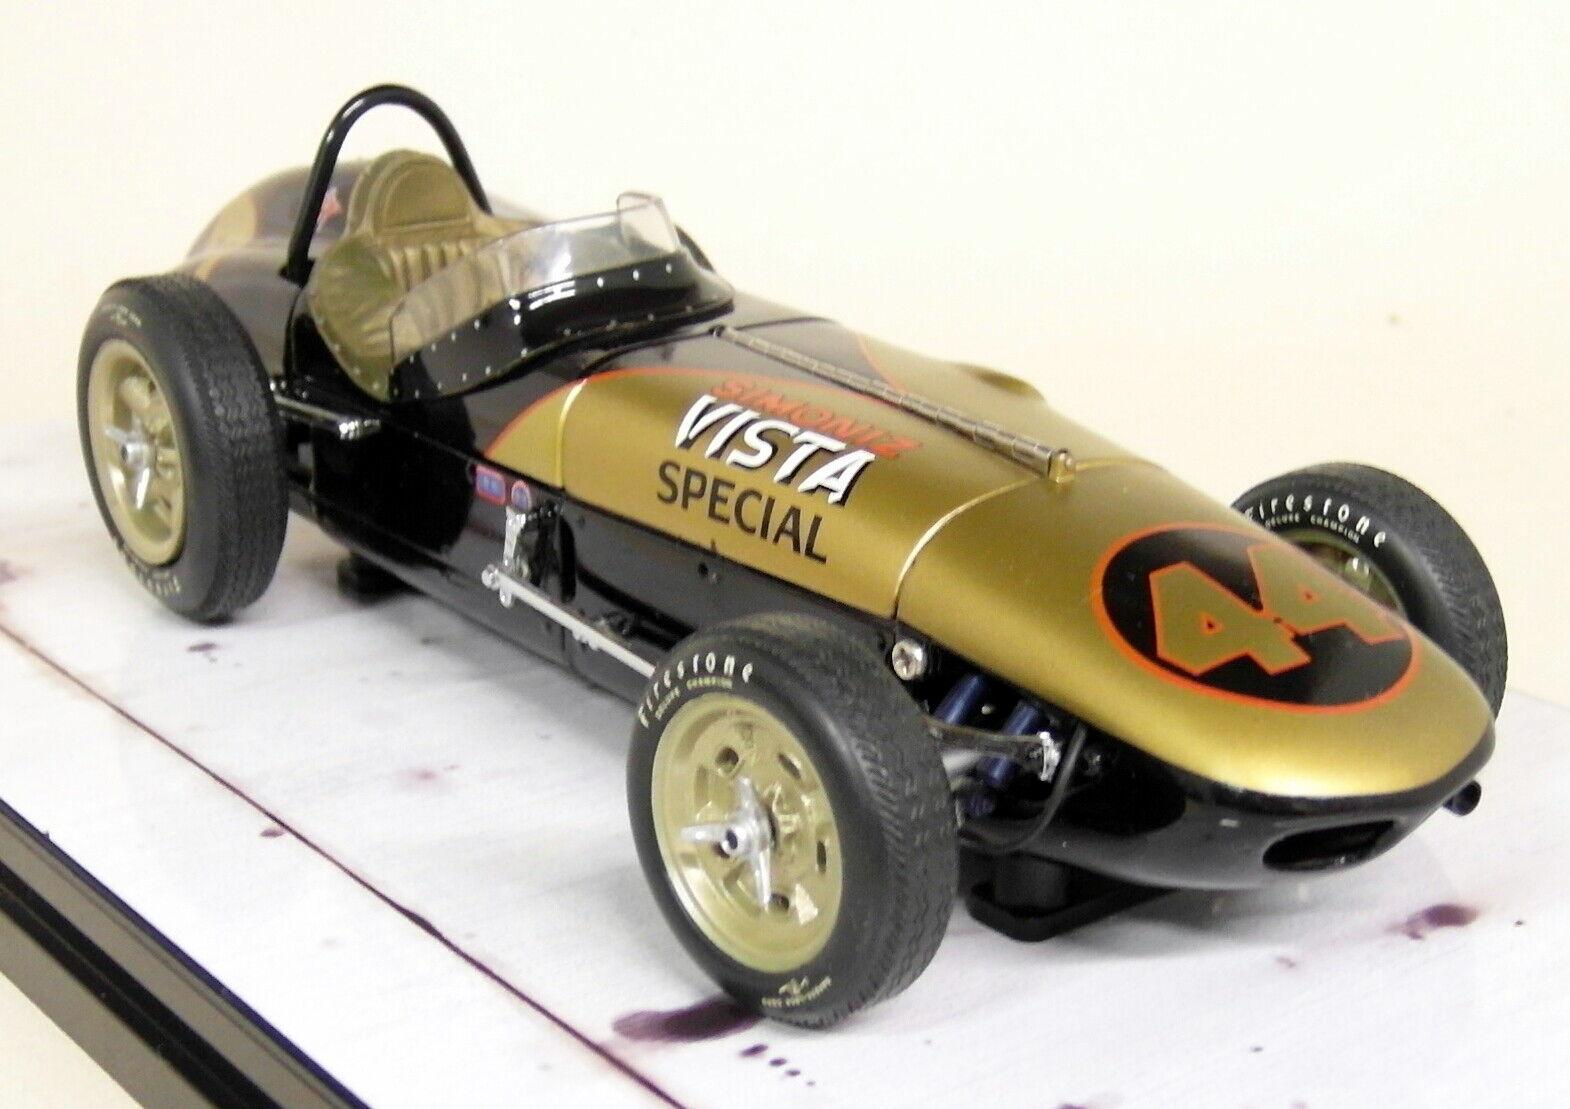 envío rápido en todo el mundo Cocheousel 1 1 1 1 18 escala 4408 Watson Roadster 1962 Indy 500 Simoniz vista especial  comprar ahora